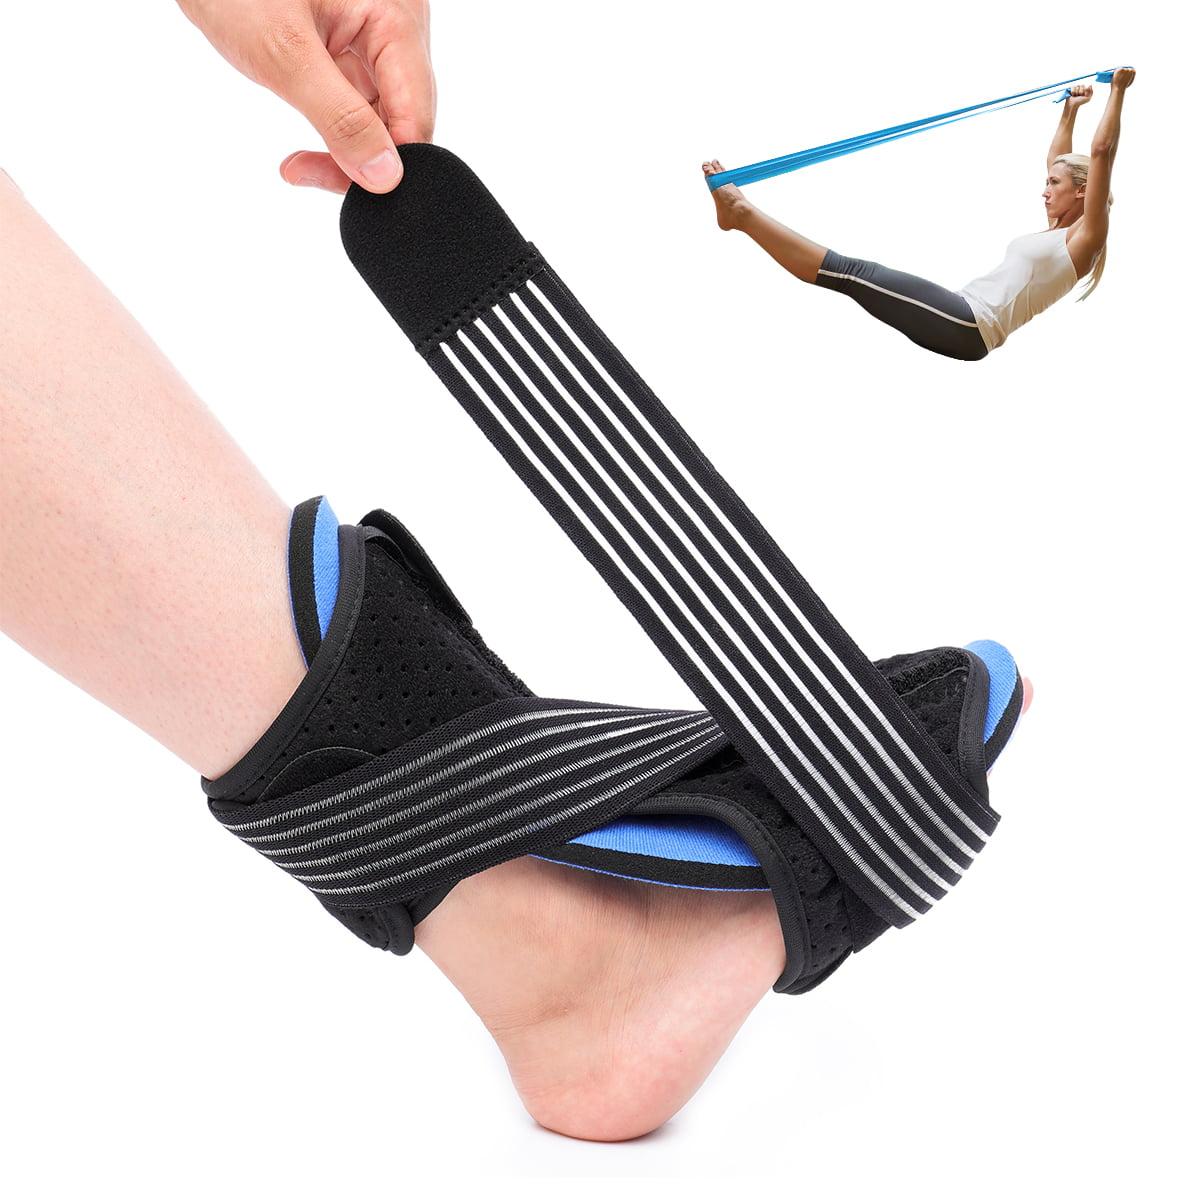 Plantar Fasciitis Night Splint Achilles Tendonitis Night Splint Adjustable Foot Drop Boot For Both Feet Foot Brace Effective Relief From Plantar Fasciitis Pain Walmart Com Walmart Com